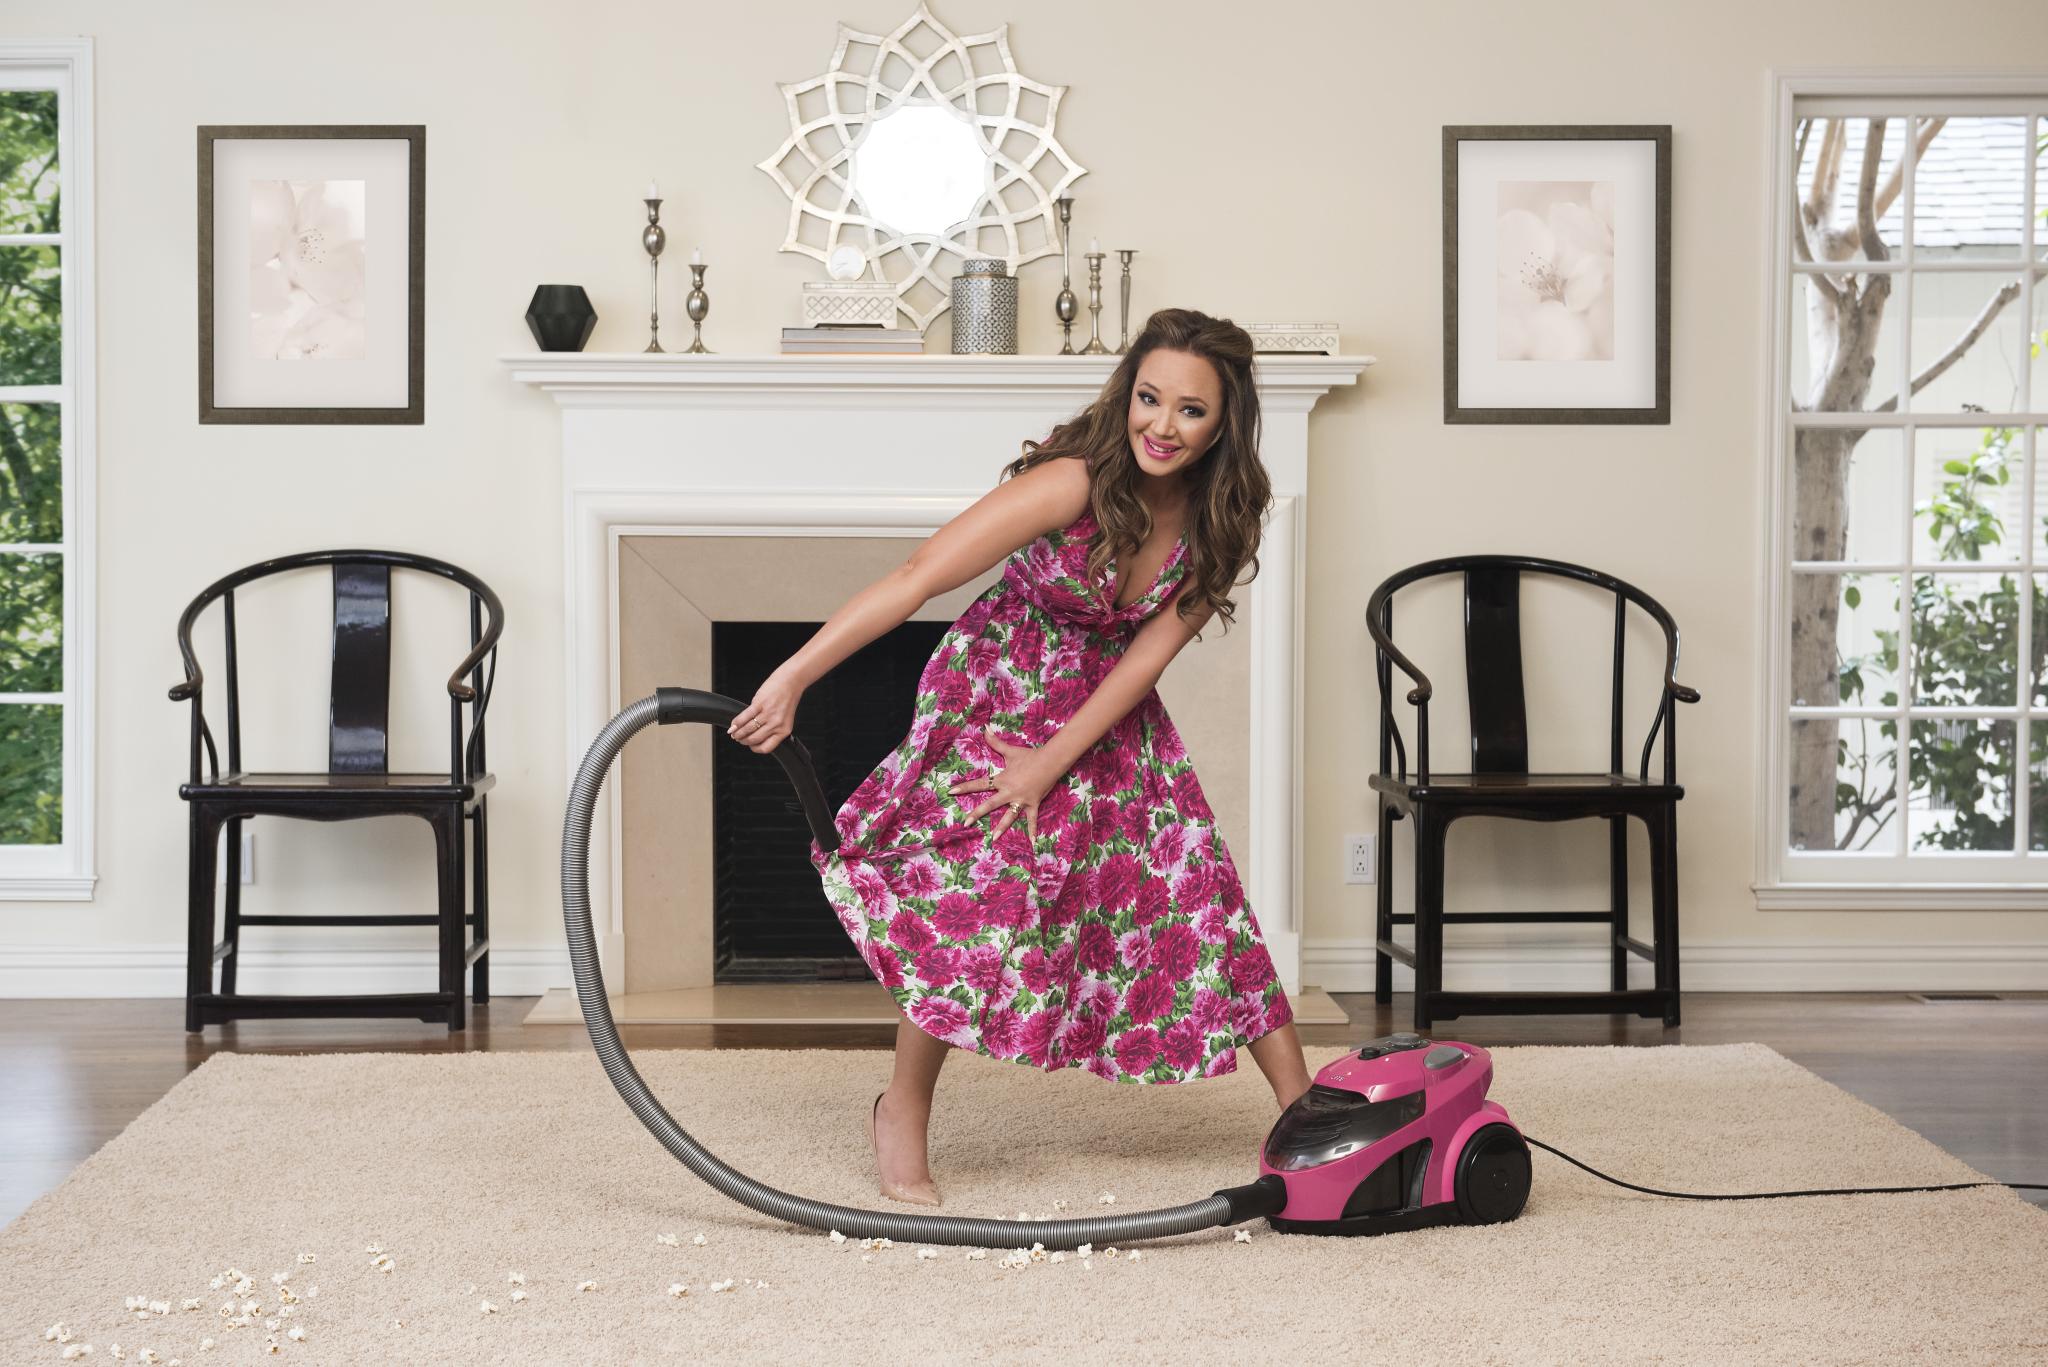 leah the homemaker